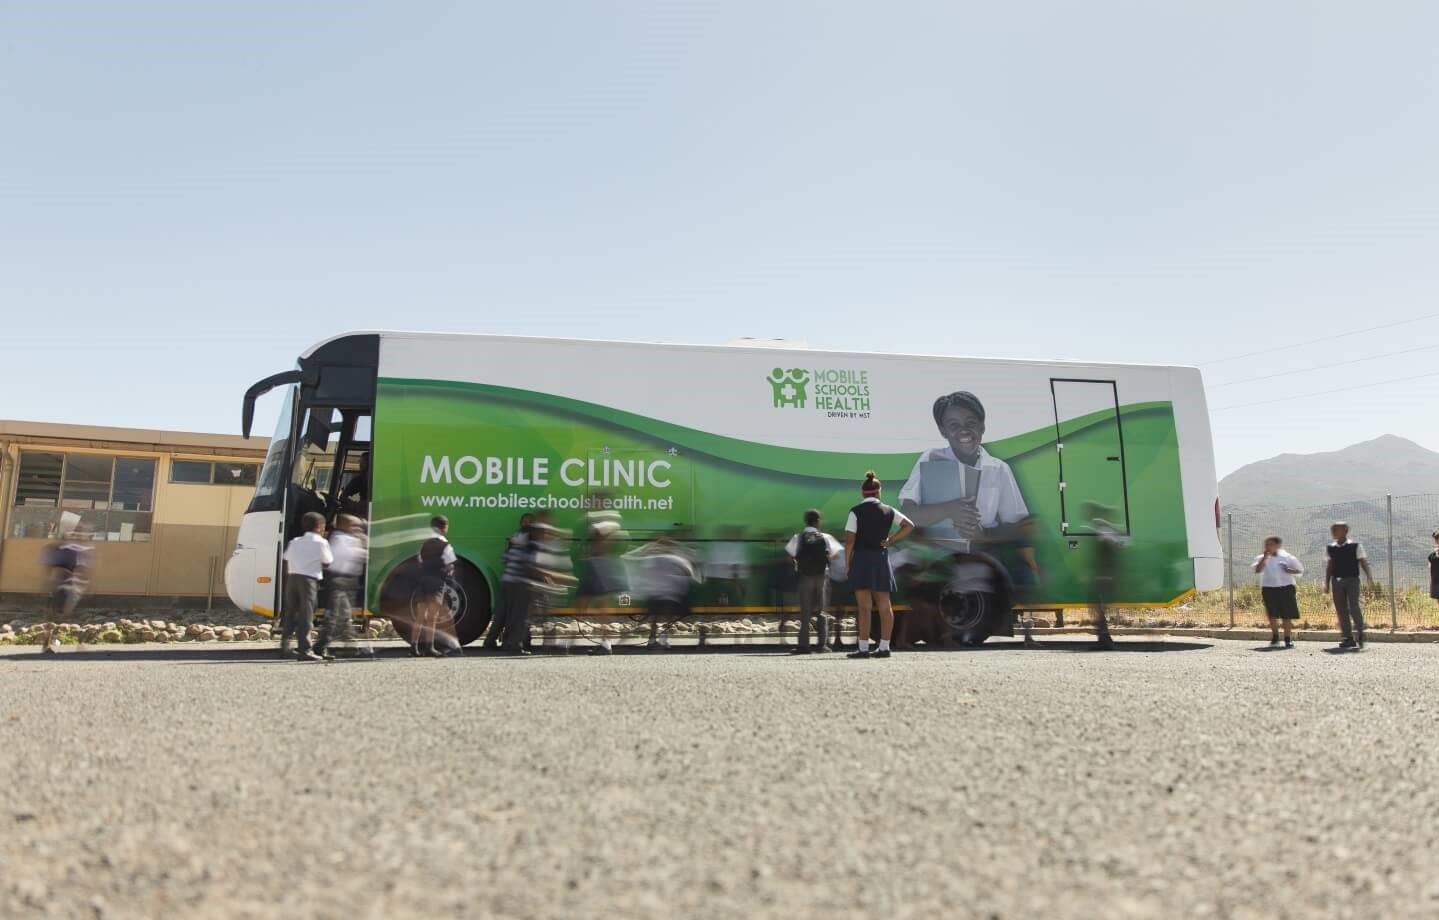 Mobile Schools Health bus outside school